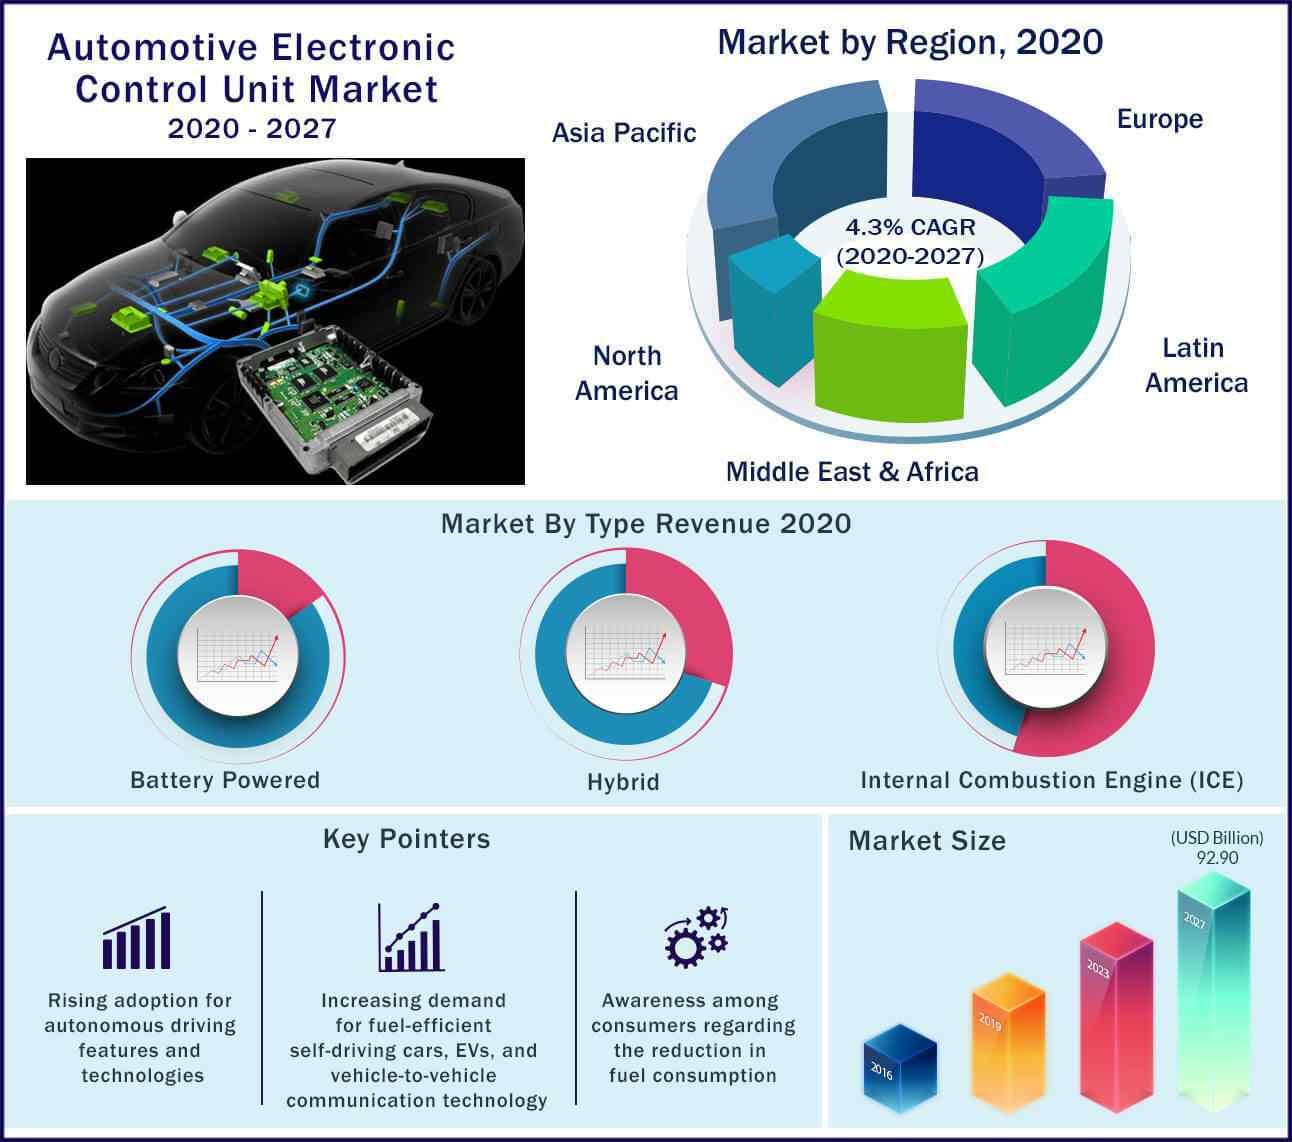 Global Automotive Electronic Control Unit Market 2020-2027